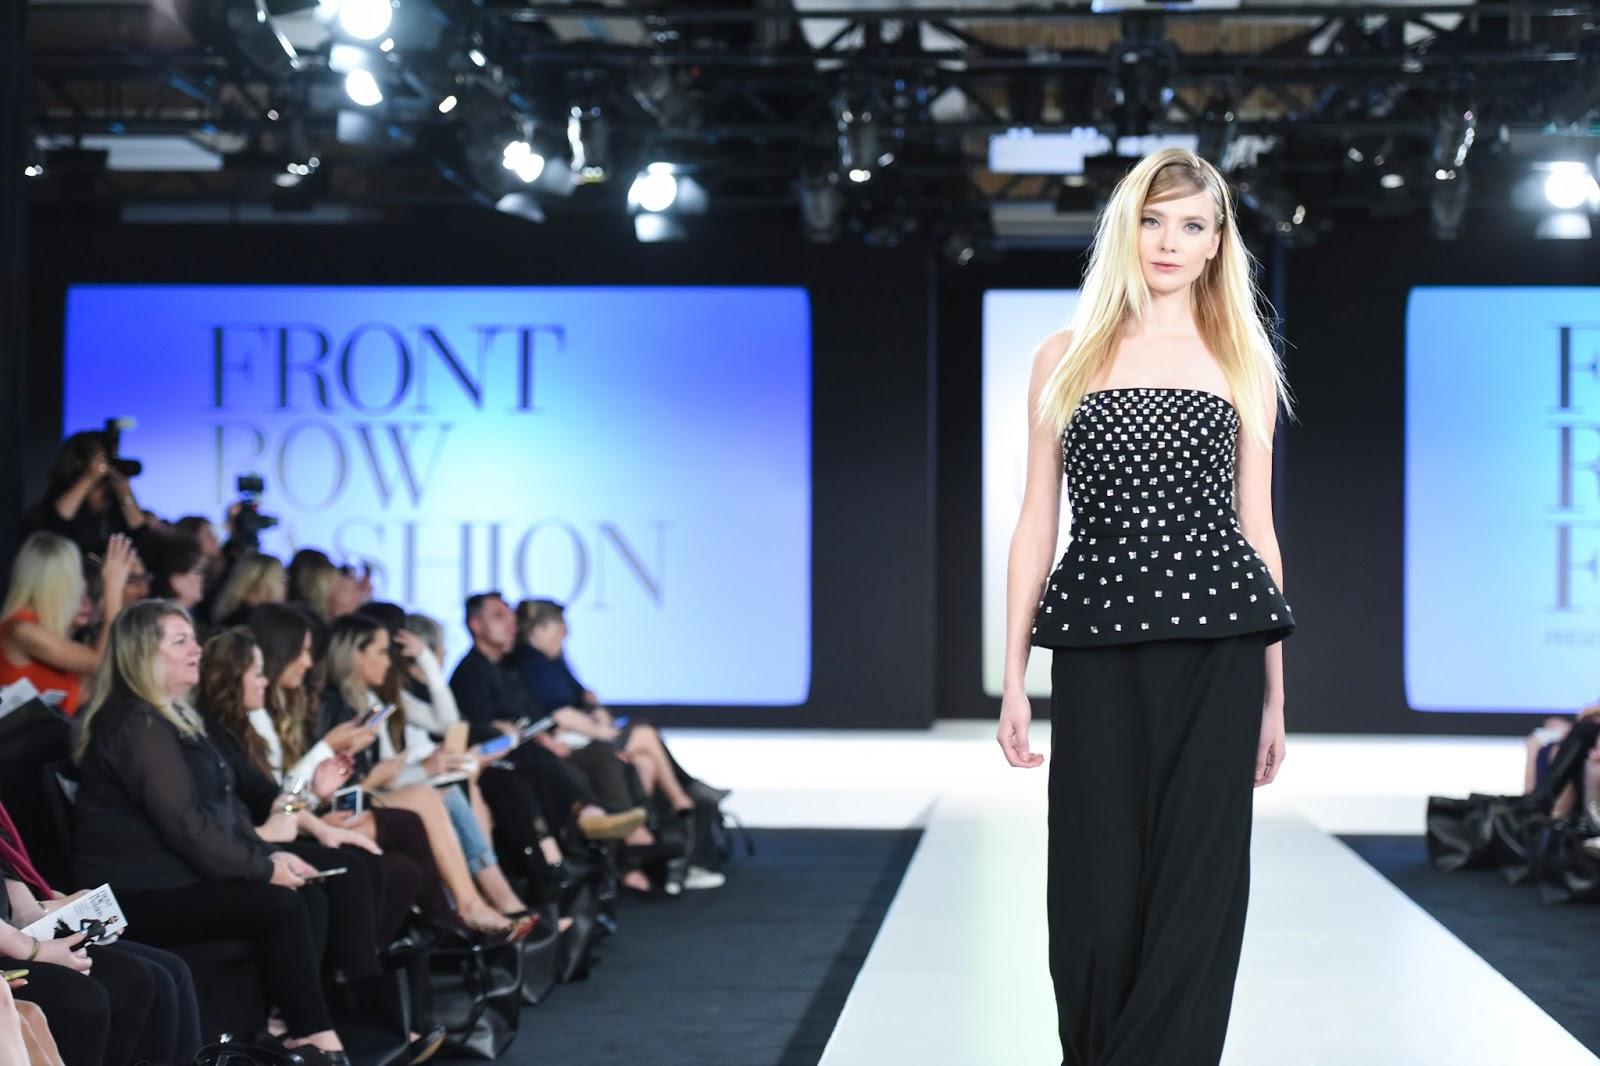 Vogue Front Row Fashion Show at Bellevue Fashion Week